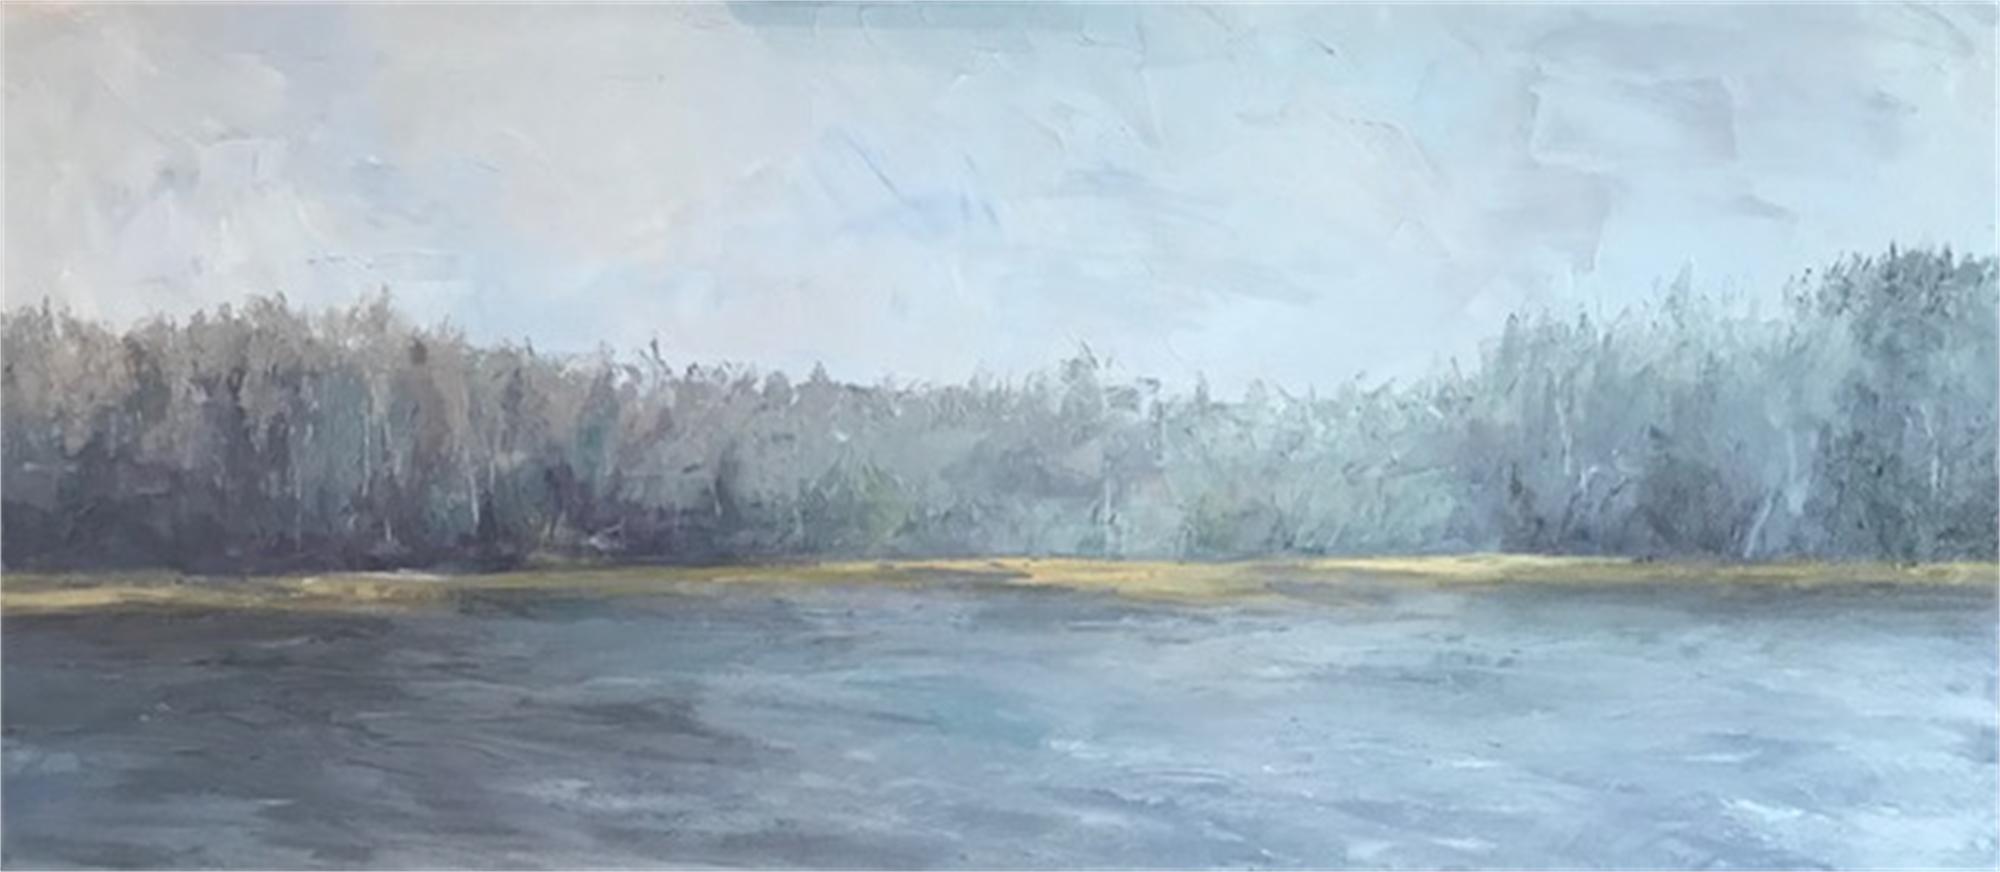 Wadsworth Cove by Susu Meyer